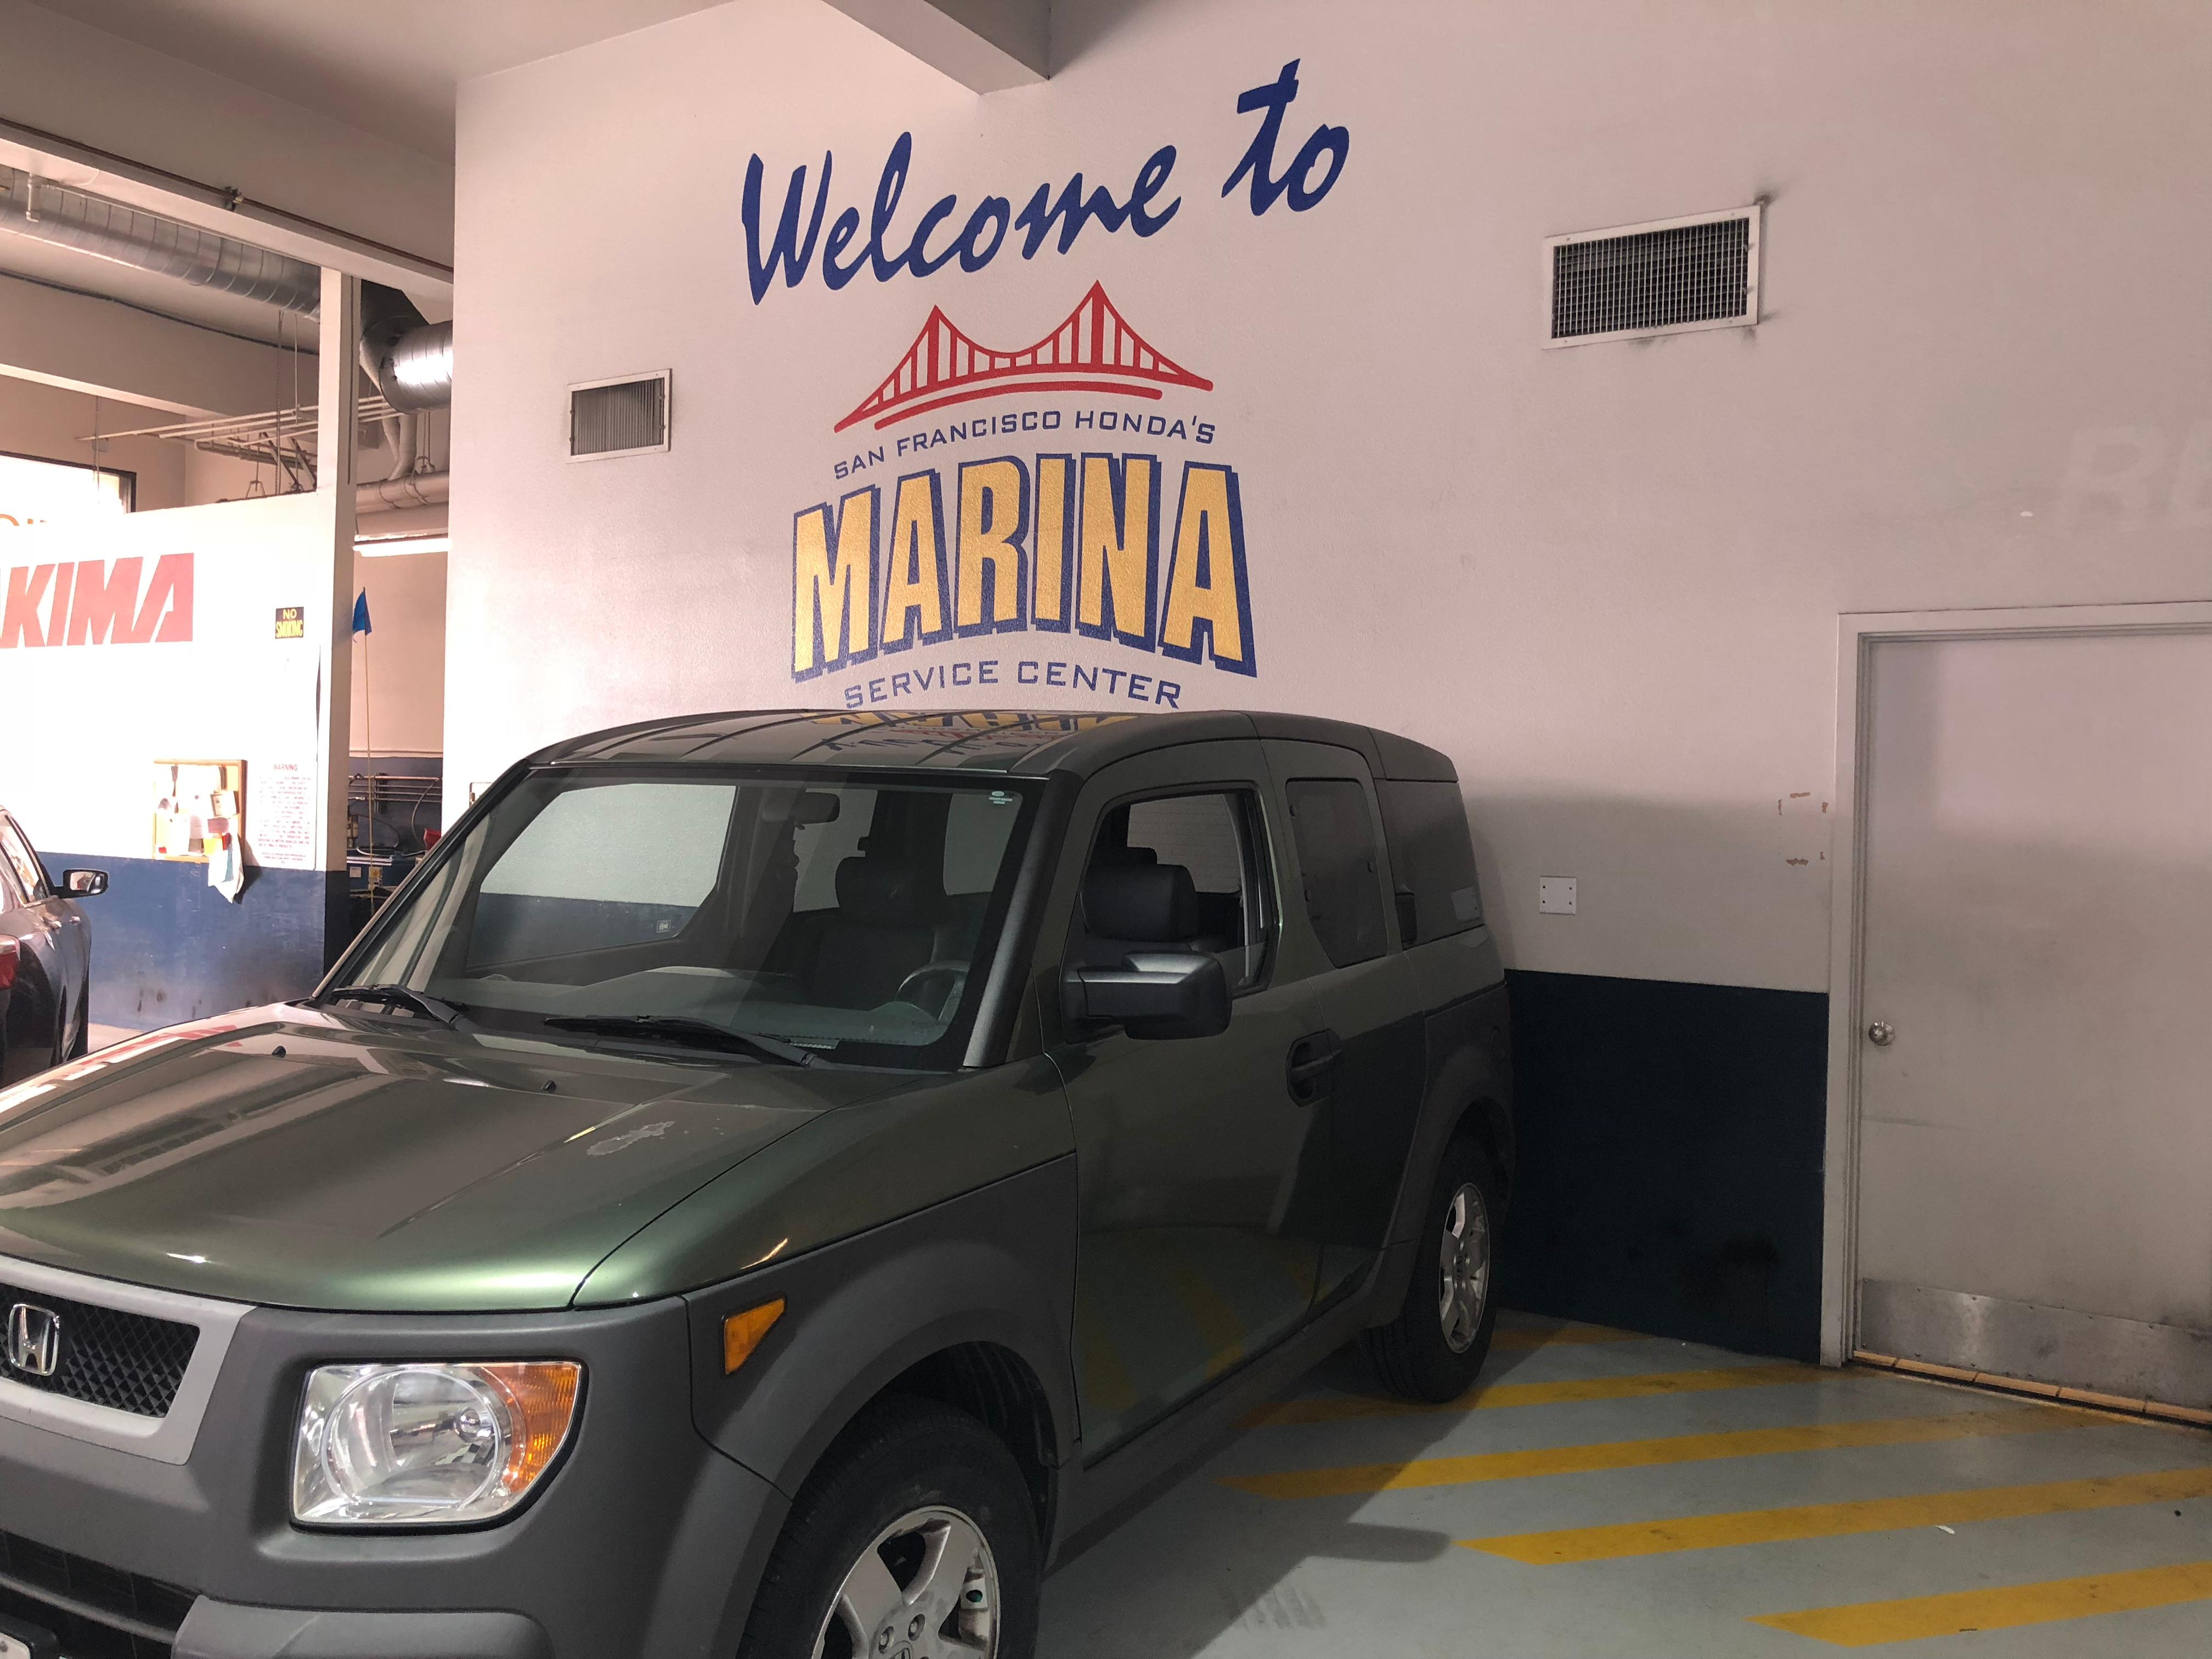 San Francisco Honda Marina Service Center